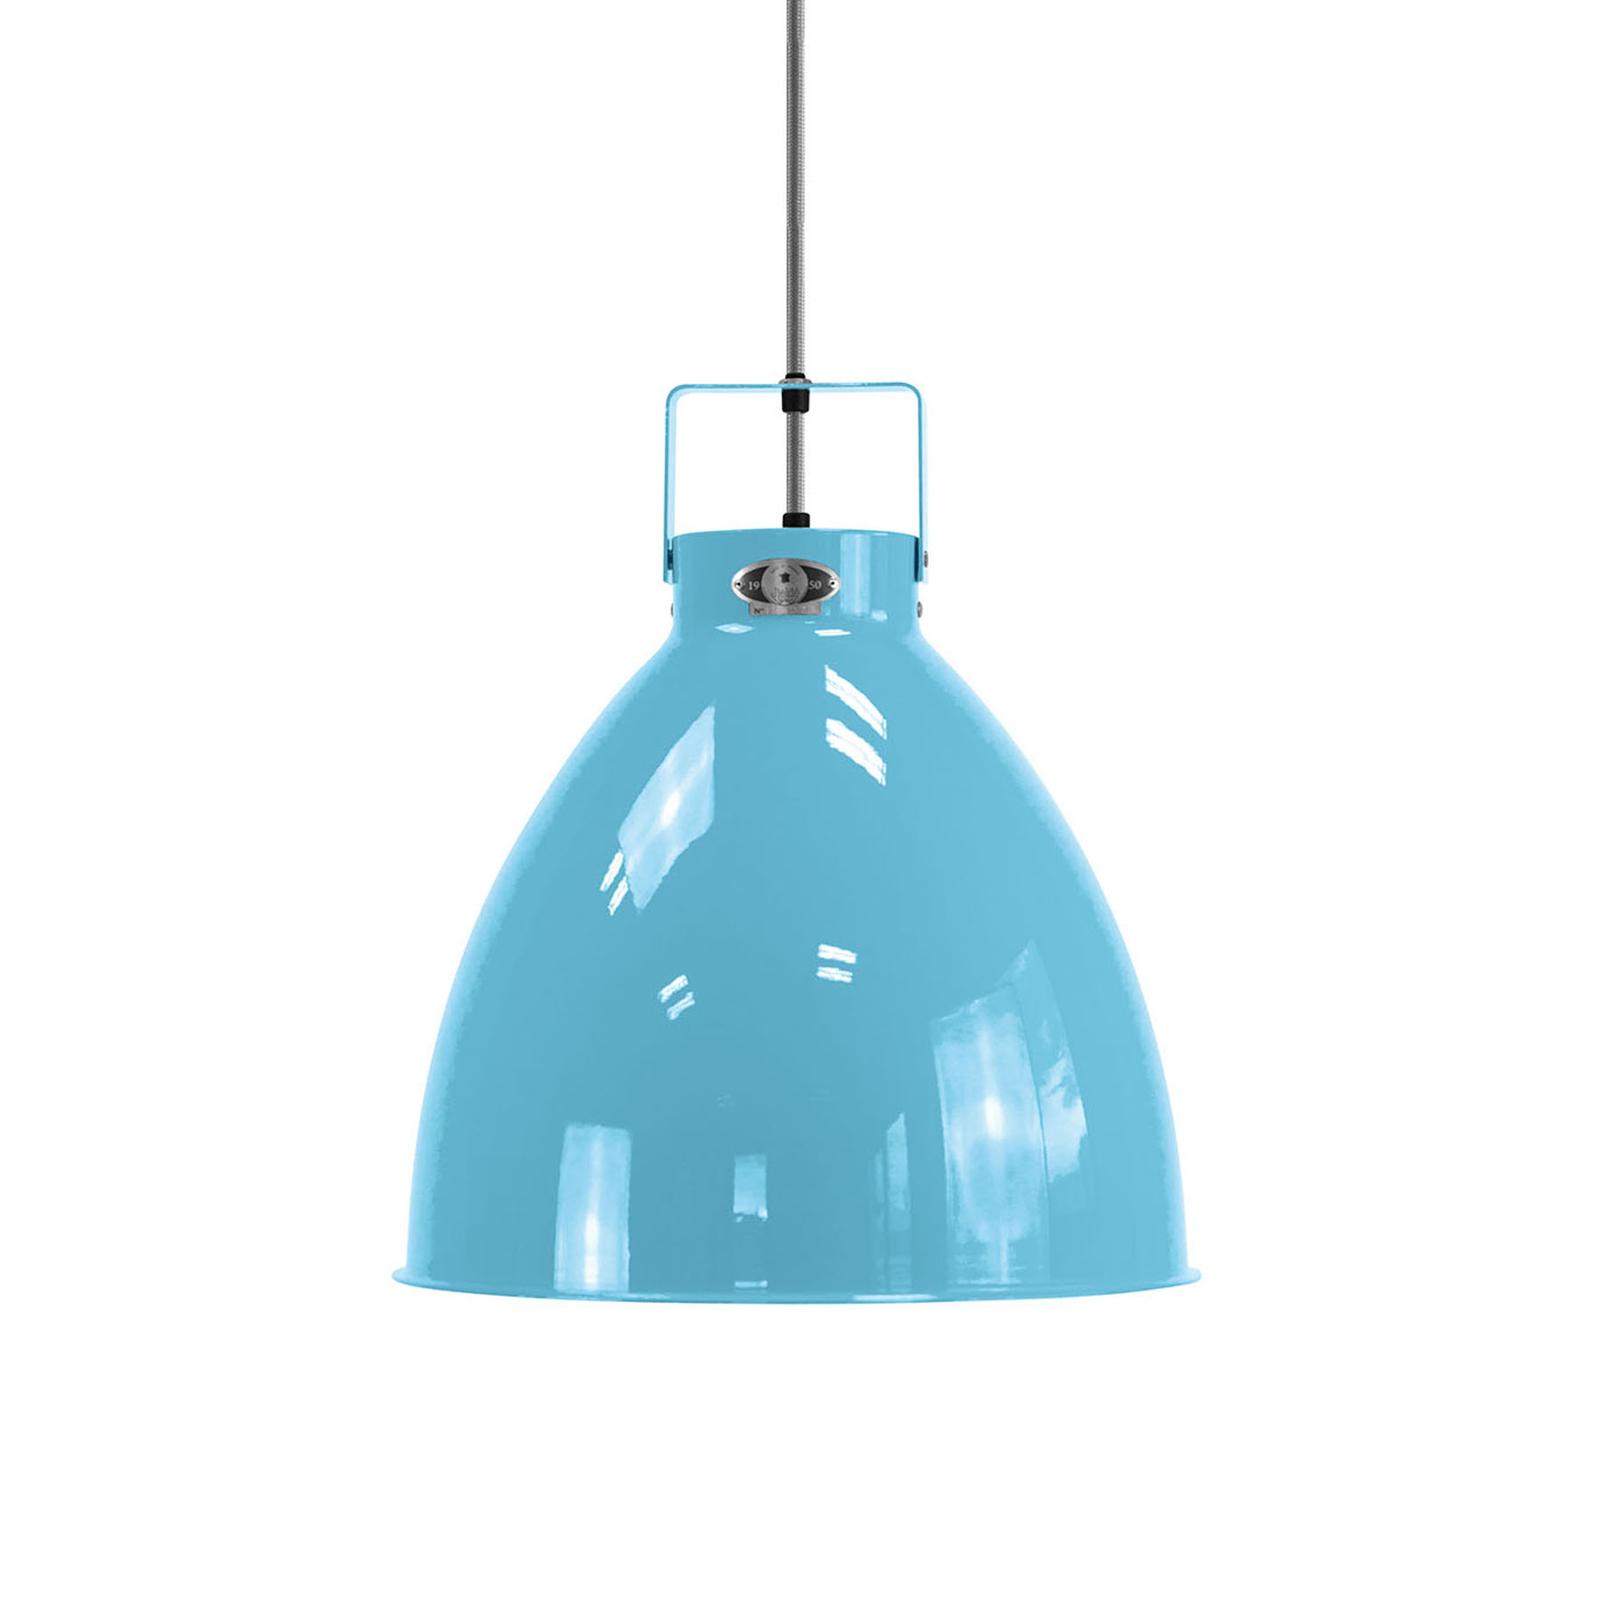 Jieldé Augustin A360 lampa wisząca jasnoniebieska